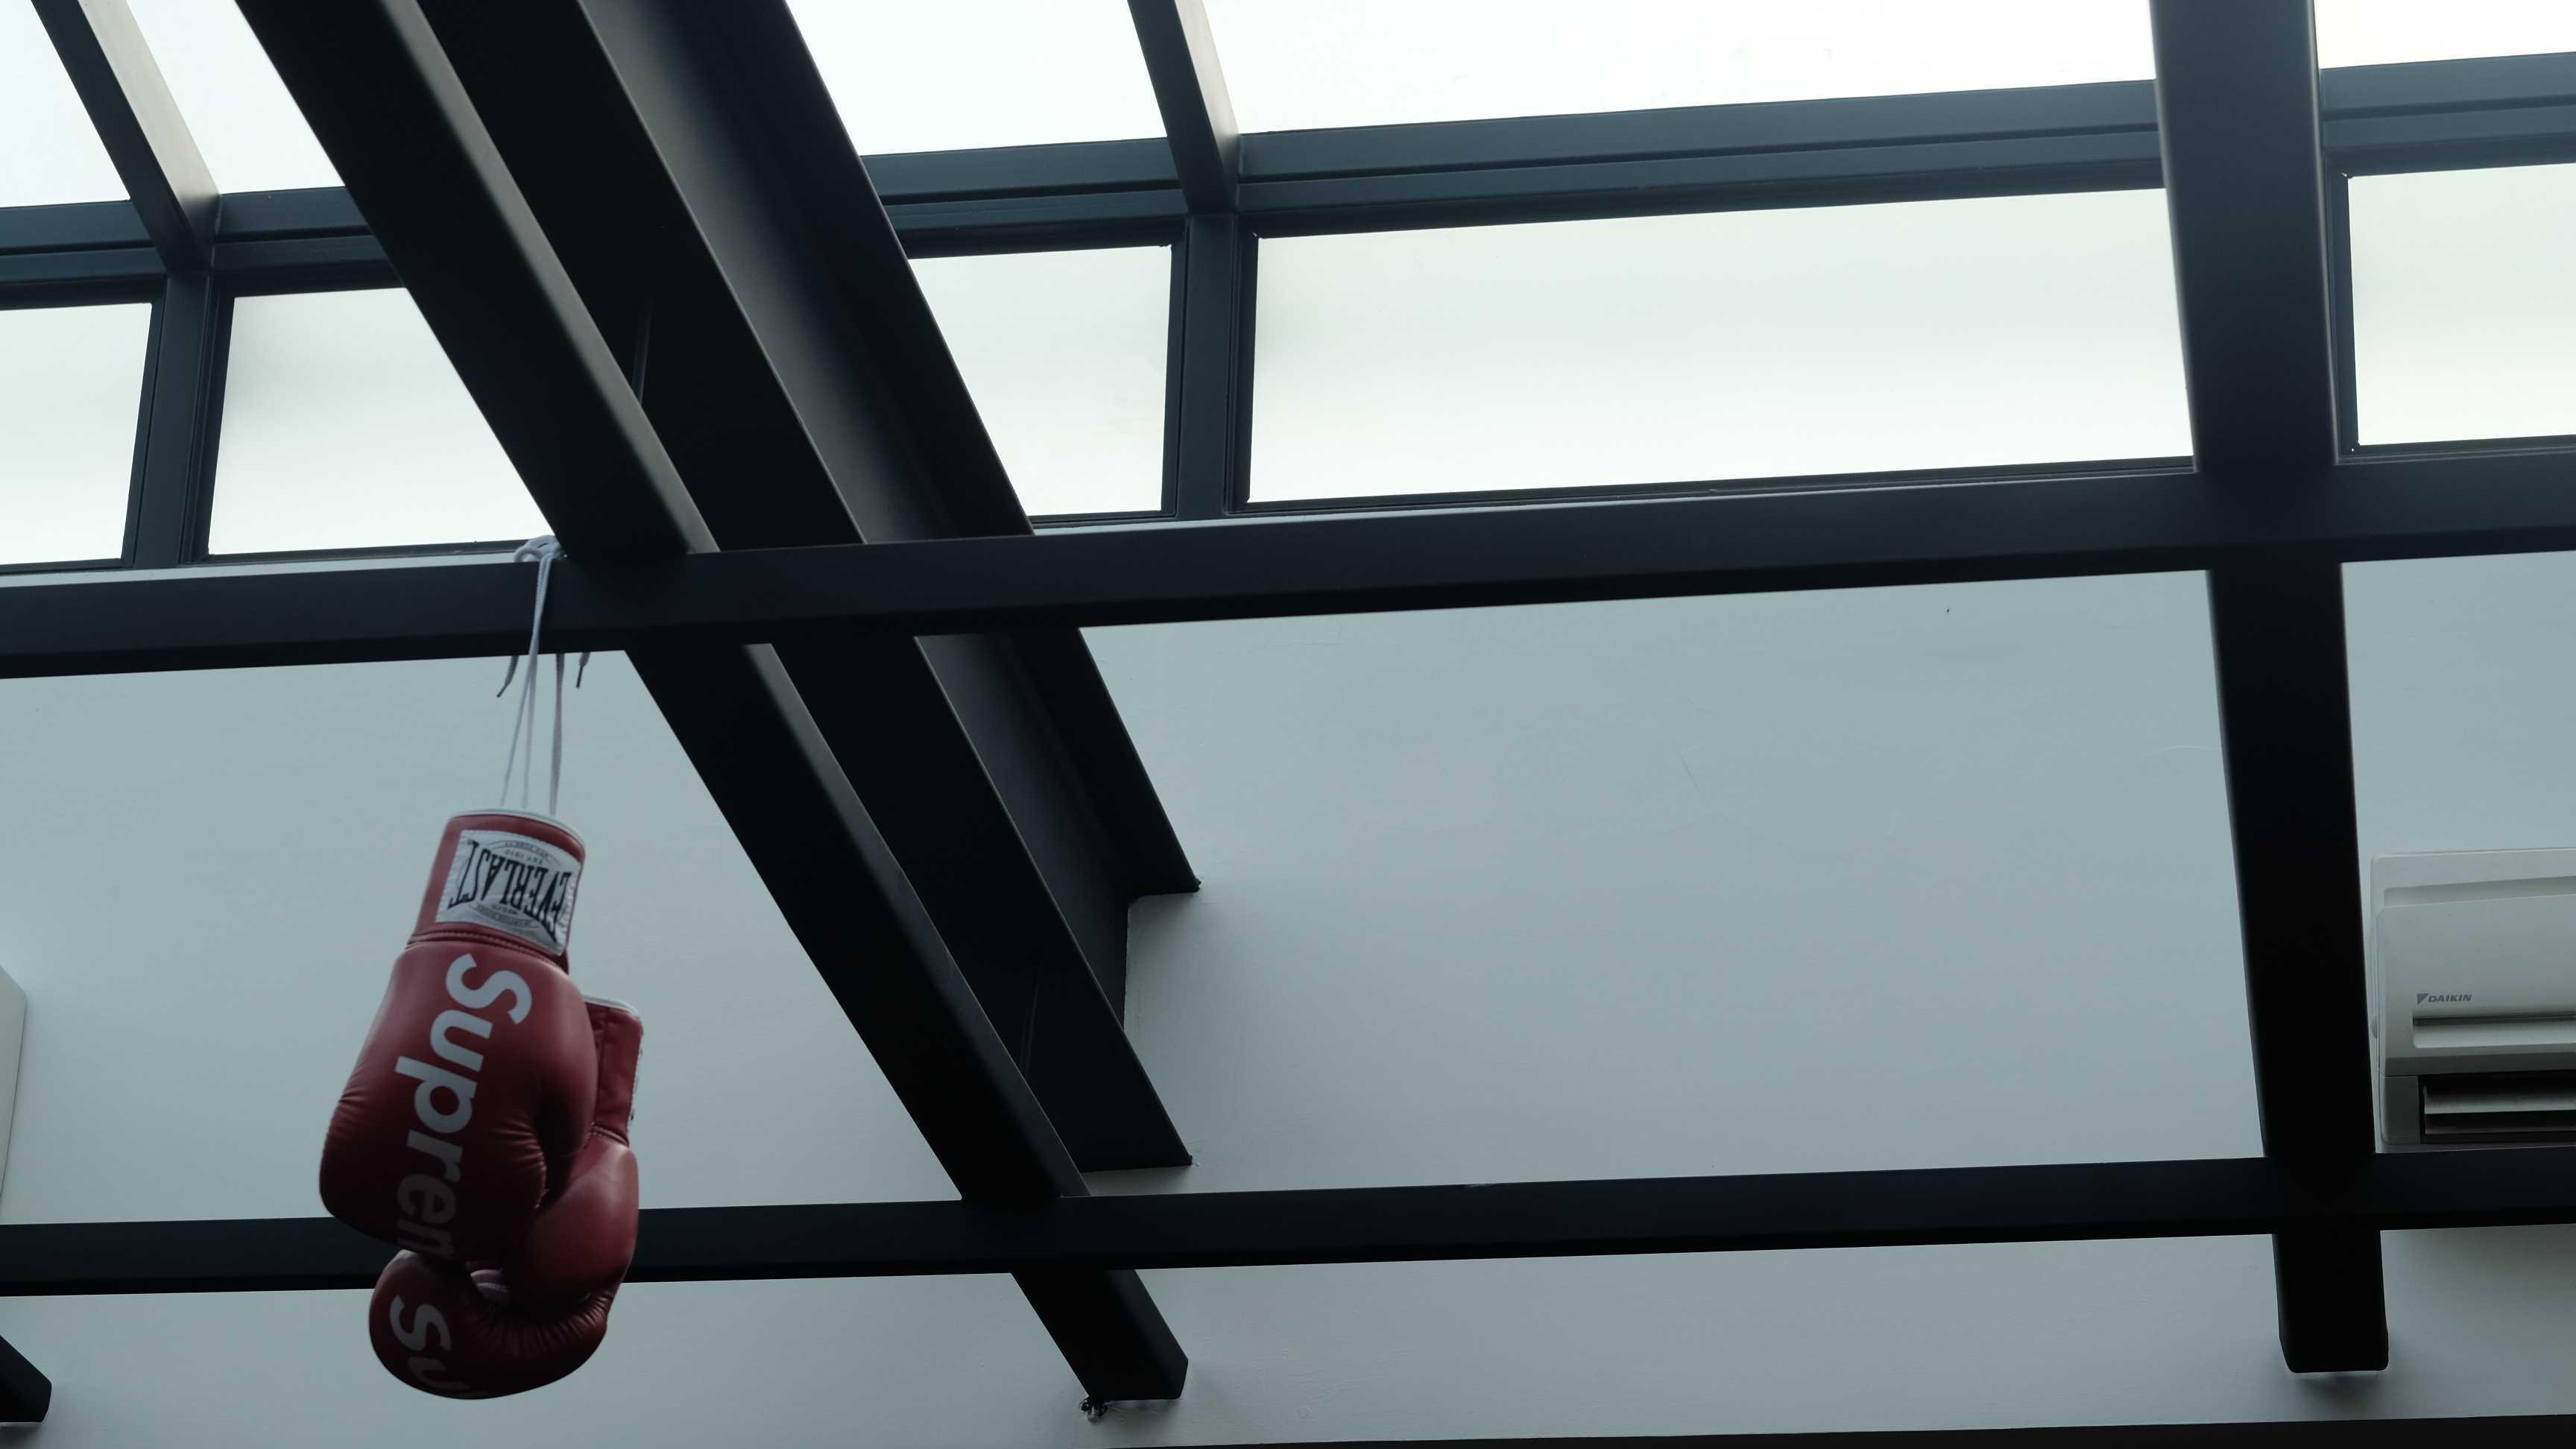 Aaksen Responsible Aarchitecture Ruckerpark Coffee And Culture Jl. Dr. Cipto No.24, Pasir Kaliki, Cicendo, Kota Bandung, Jawa Barat 40171, Indonesia Jl. Dr. Cipto No.24, Pasir Kaliki, Cicendo, Kota Bandung, Jawa Barat 40171, Indonesia Ceiling Industrial  46554